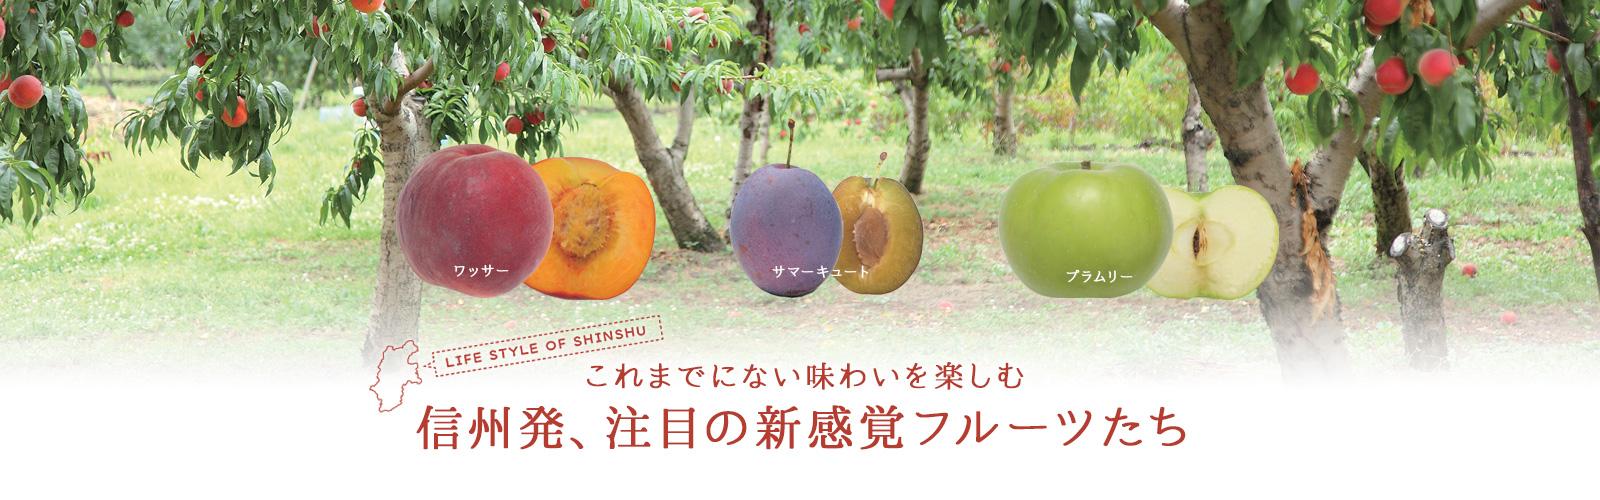 Lifestyle of Shinshu 信州発、注目の新感覚フルーツたち